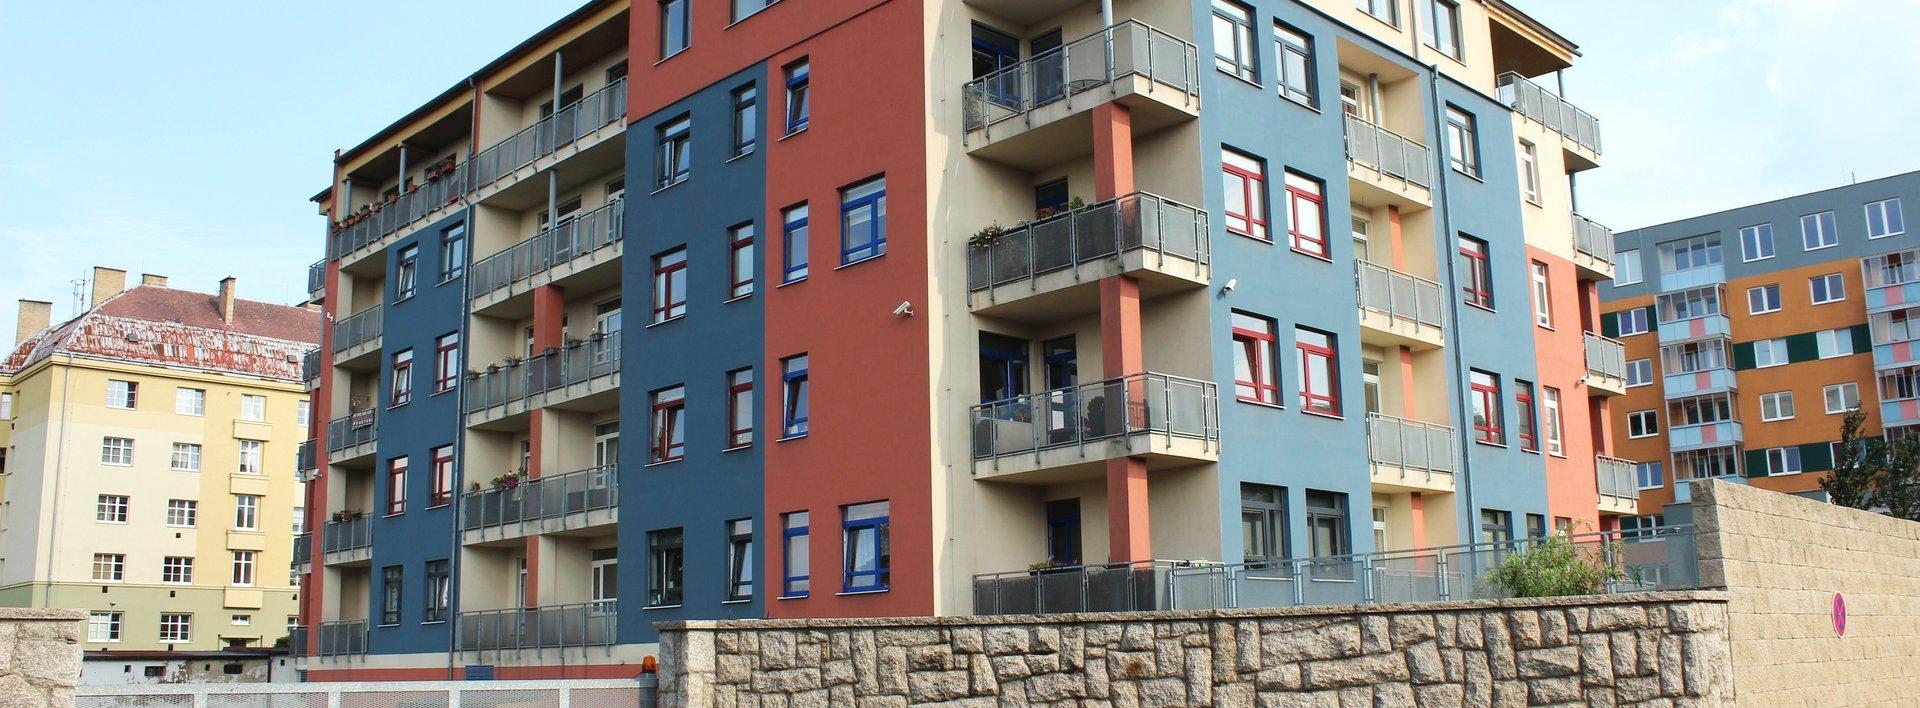 Pronájem bytu 2+kk s garáží, 53 m2, ul.Uralská, Liberec, Ev.č.: N48150